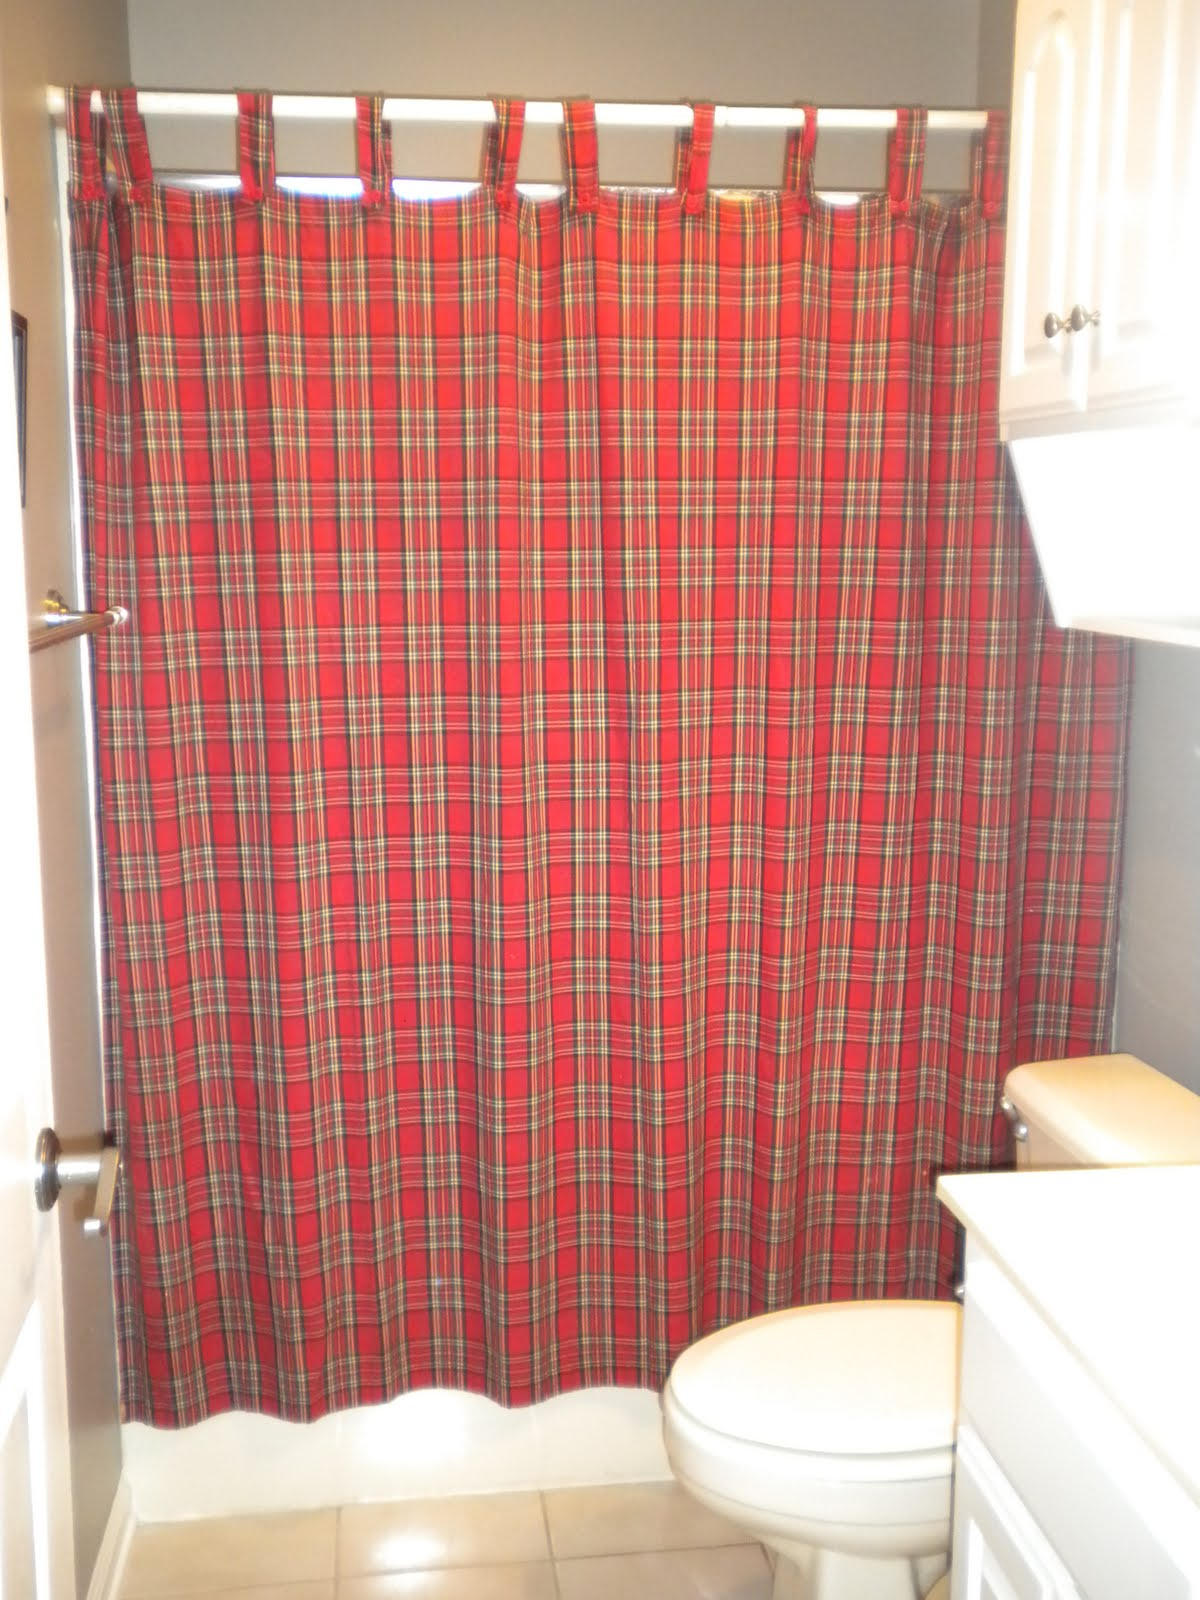 Bugs And Sunshine Custom Shower Curtain